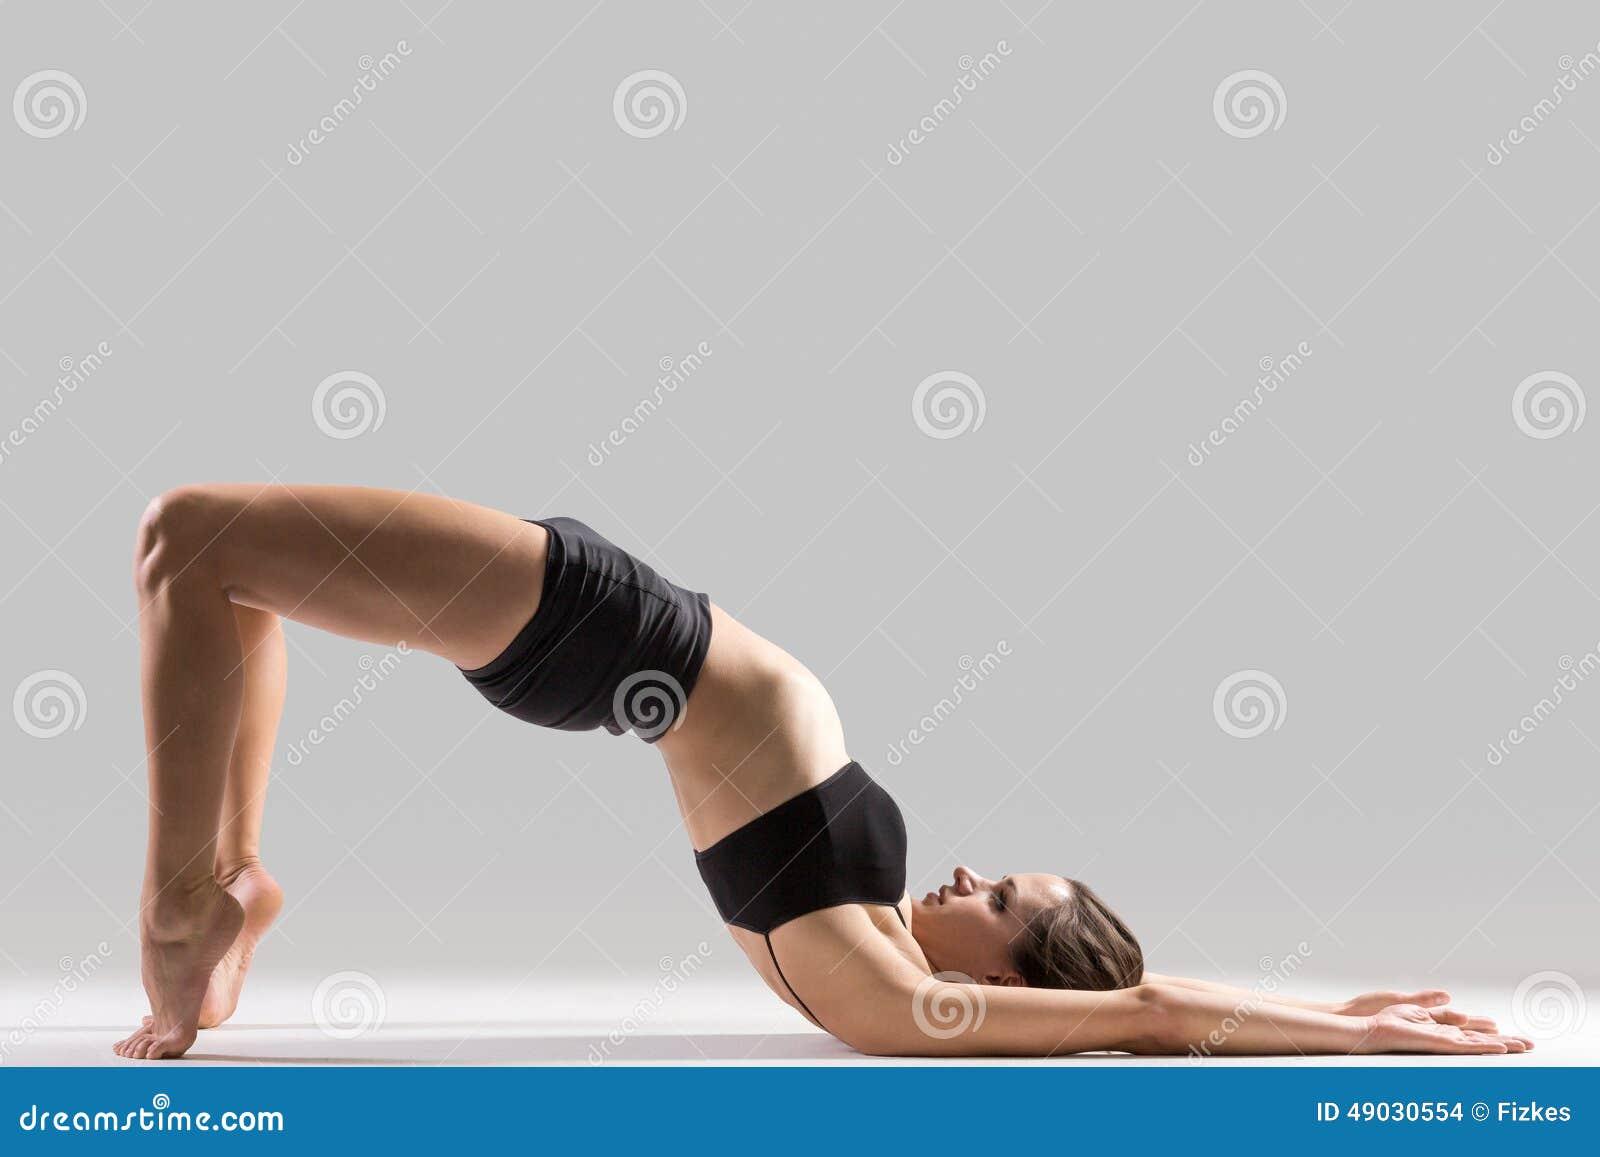 Download Yogi Gymnast Girl Doing Exercise For Spine Stock Photo - Image of graceful, lifestyle: 49030554